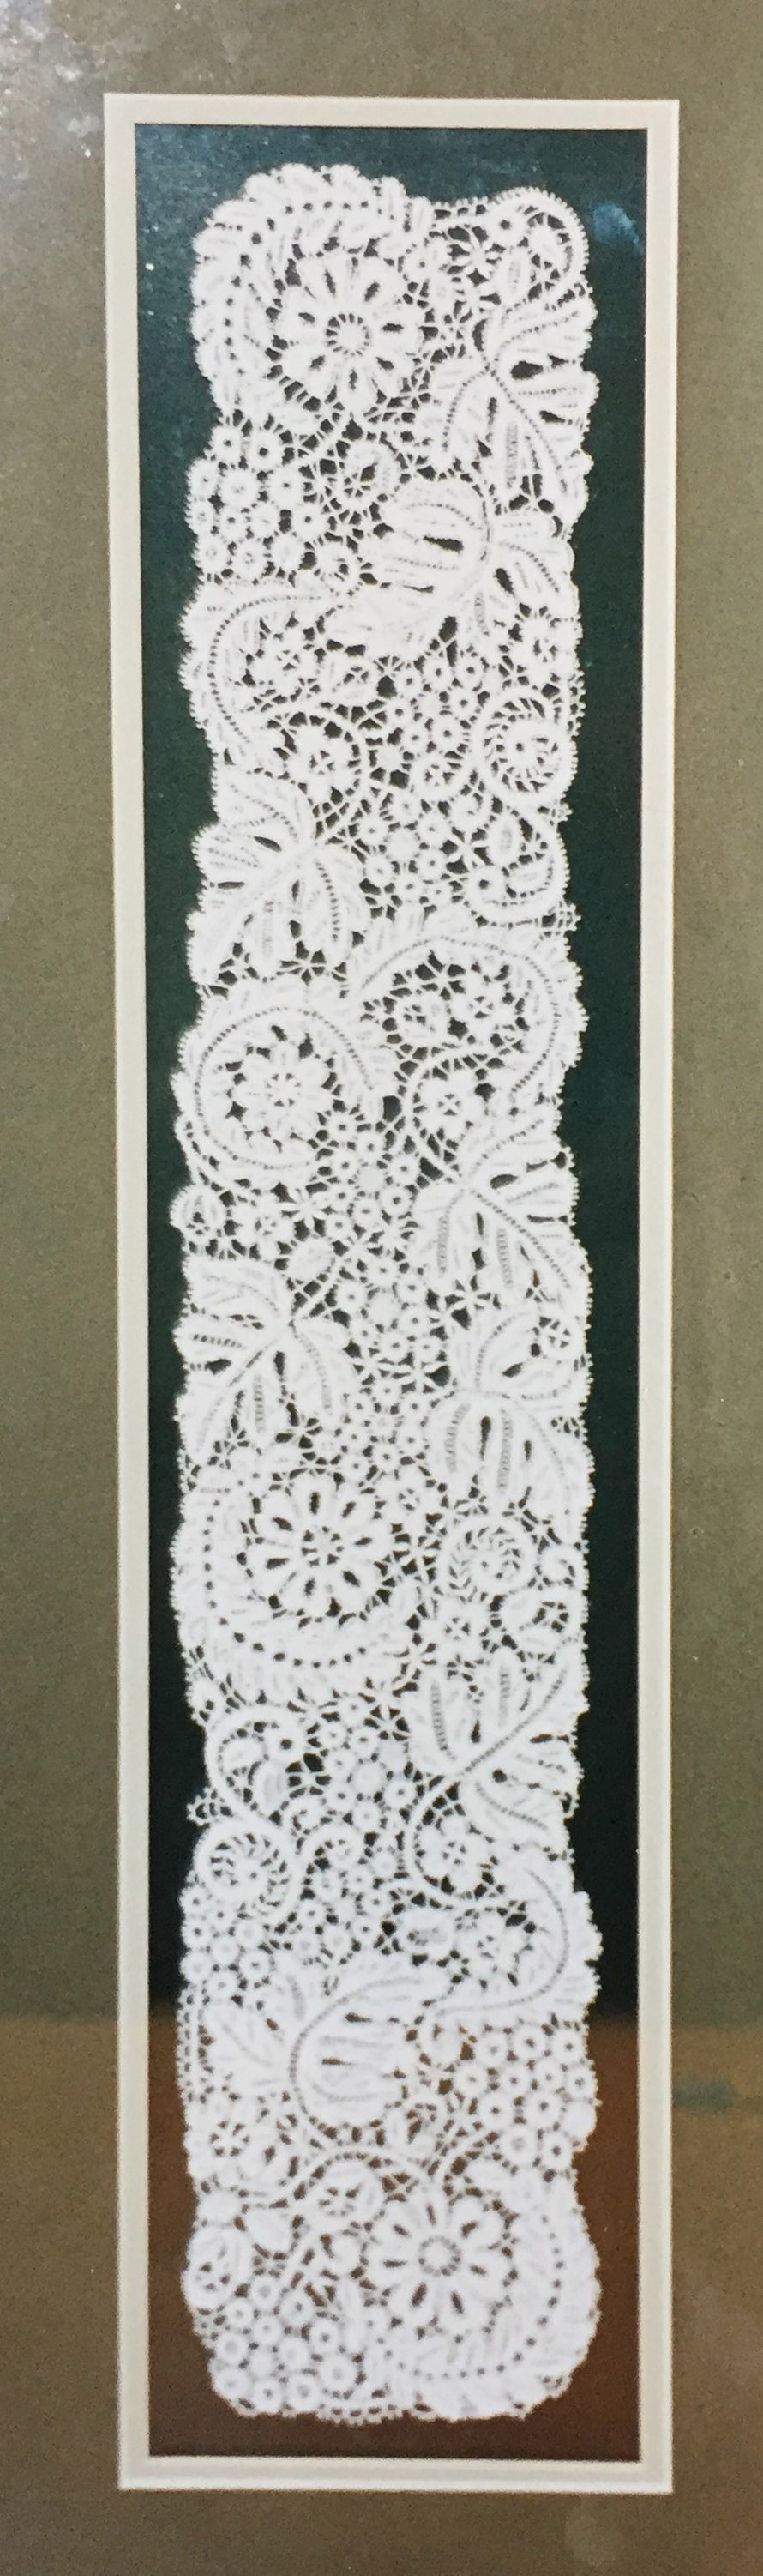 Bedfordshire Panel